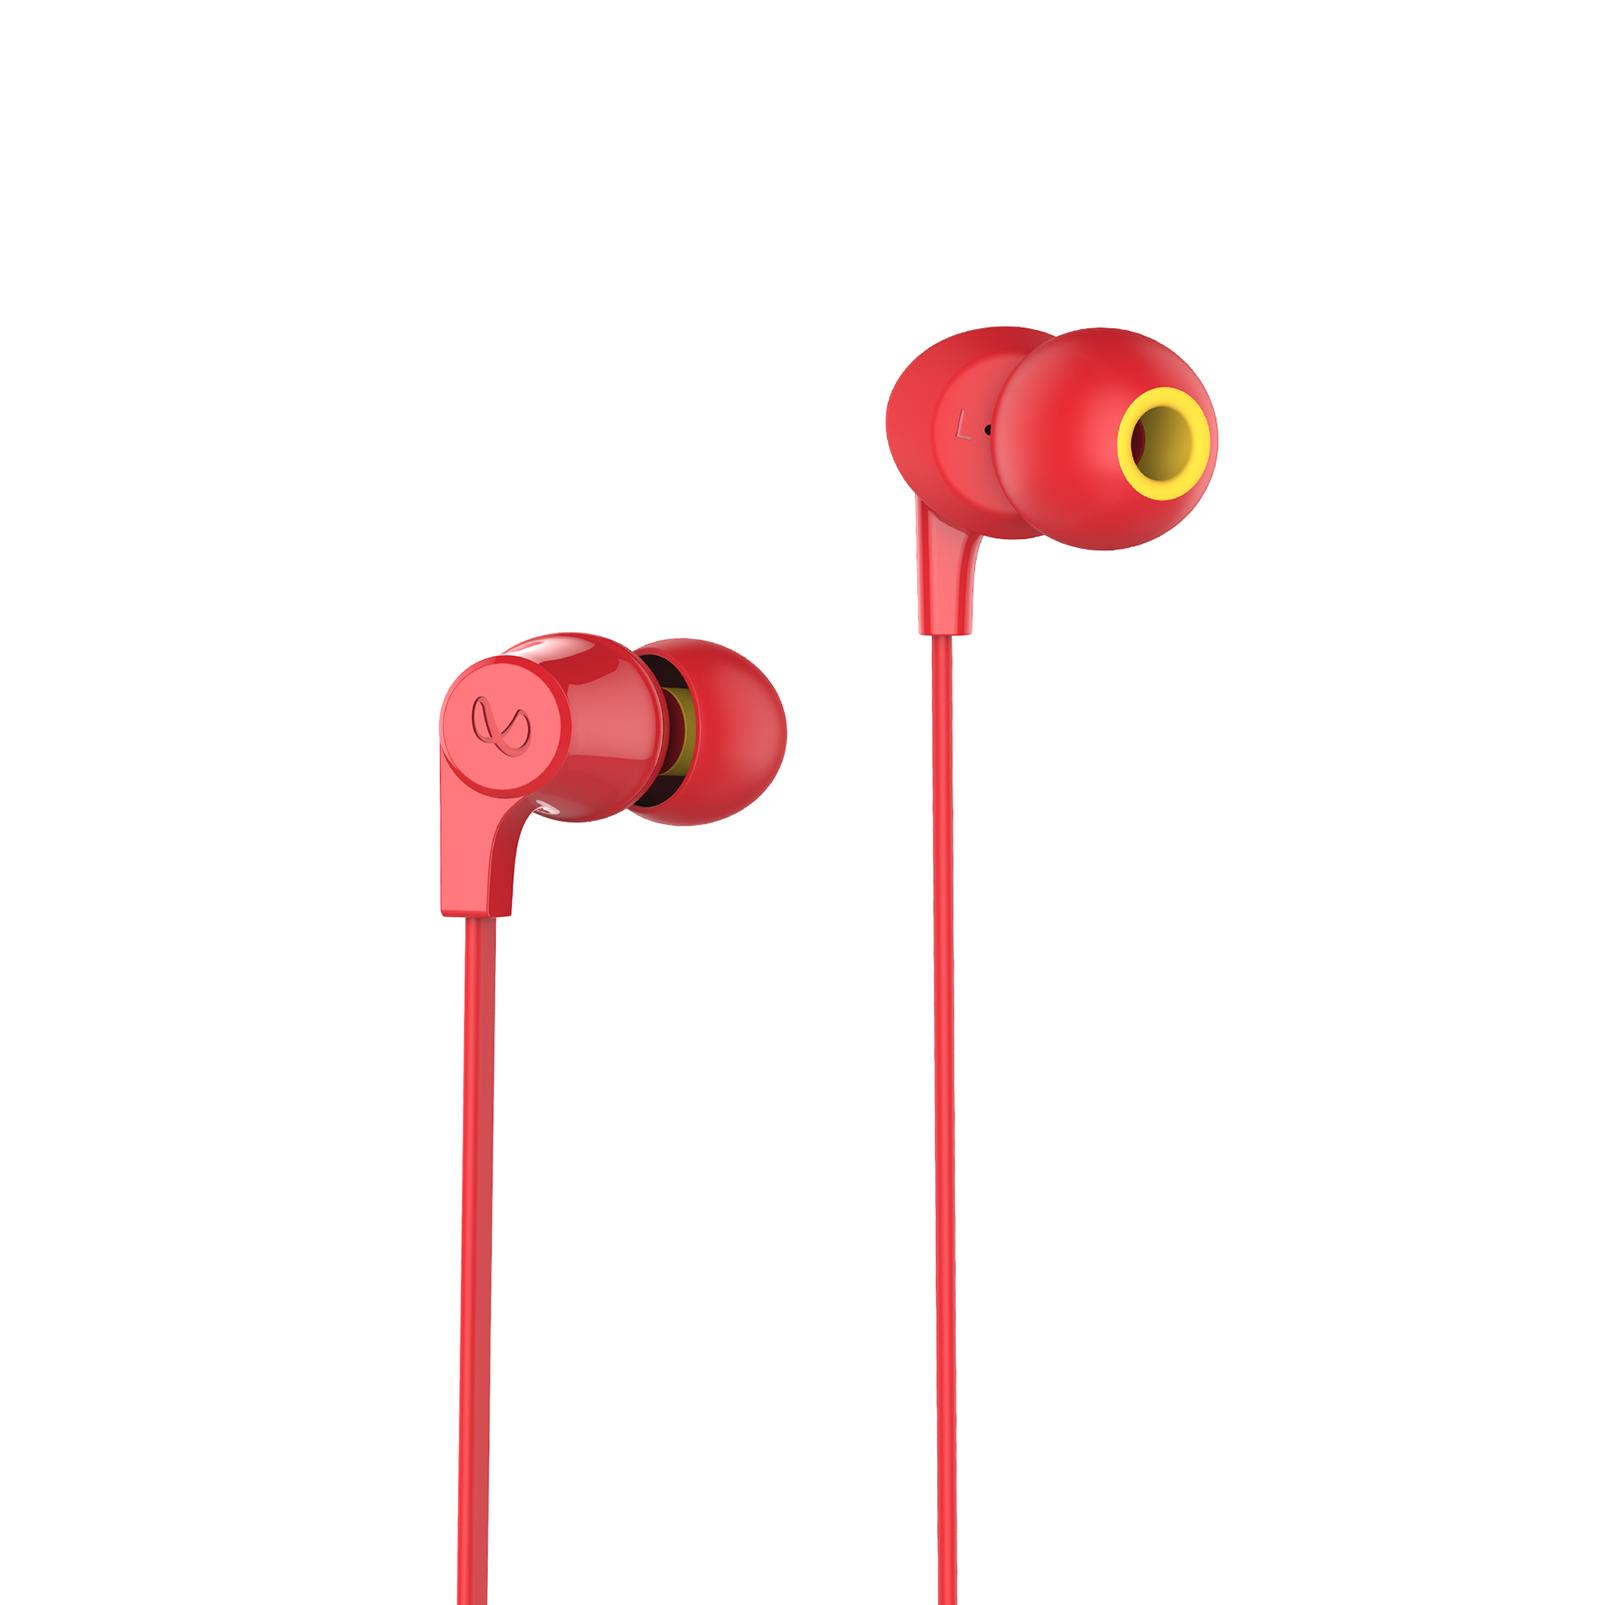 INFINITY GLIDE 100 - Red - In-Ear Wireless Headphones - Front